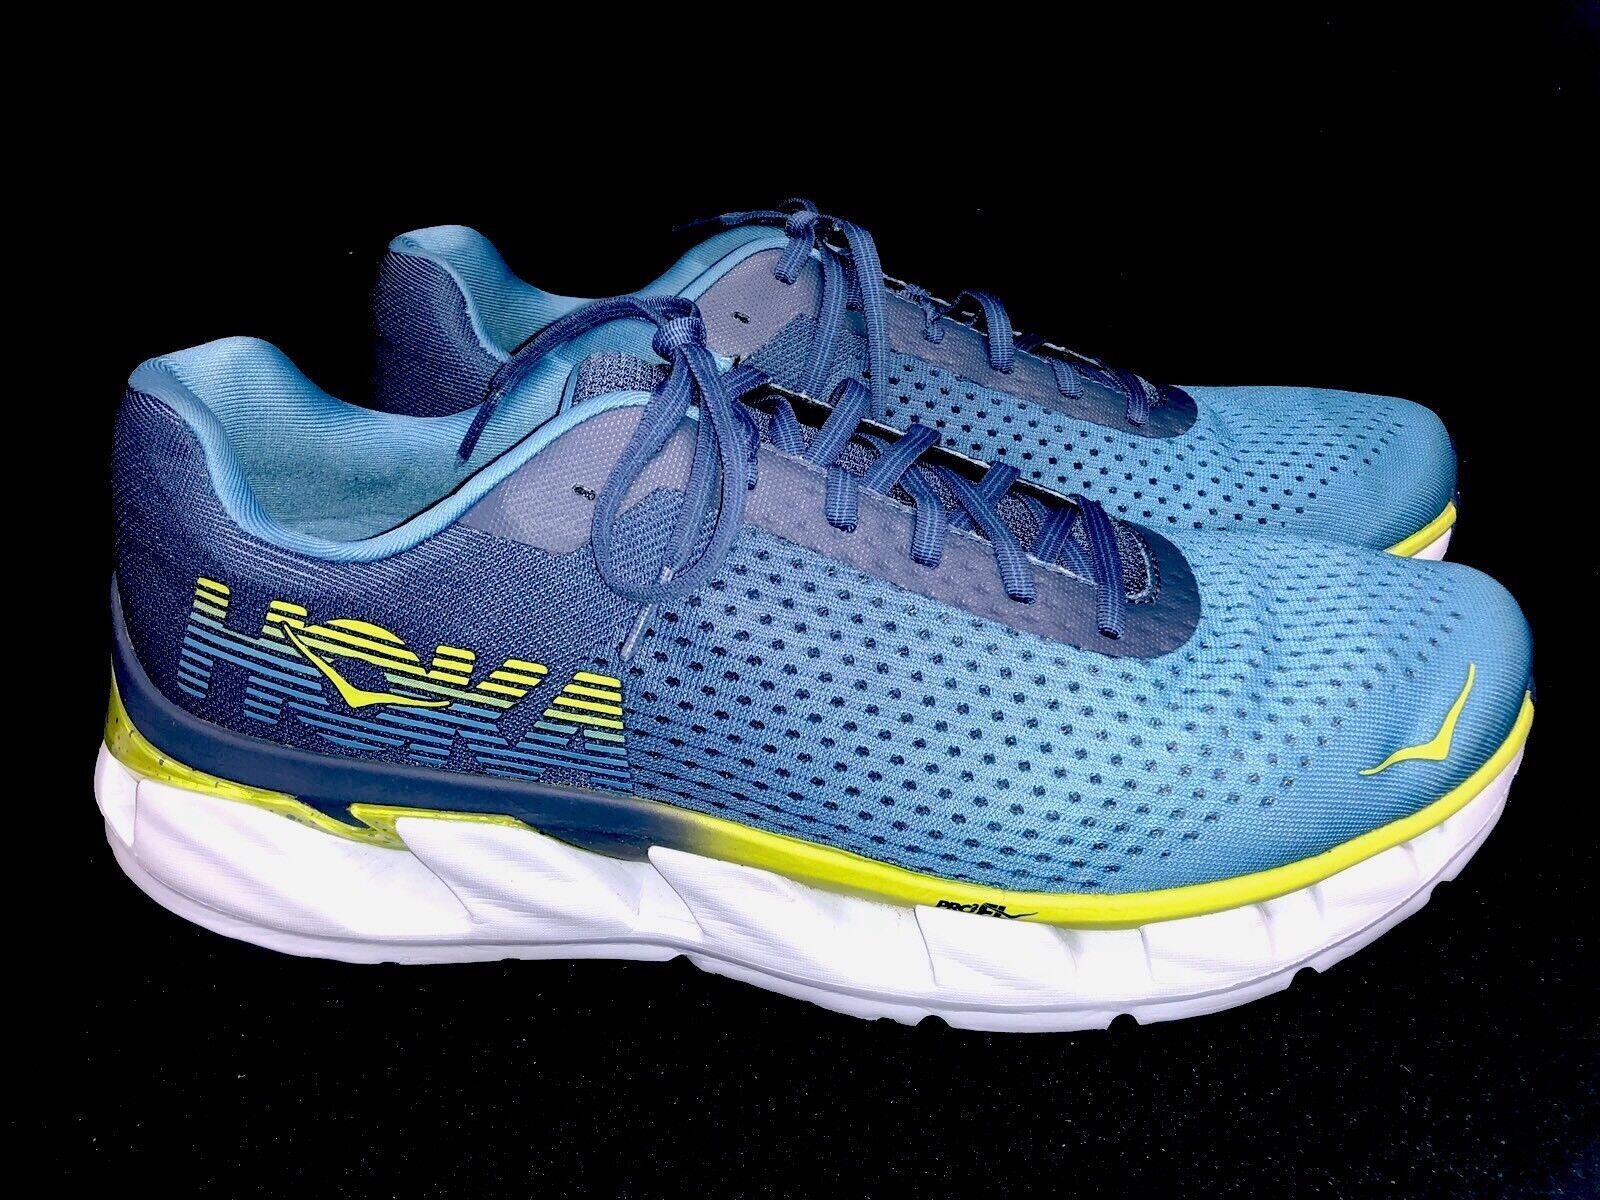 HOKA ONE ONE Elevon running tennis scarpe scarpe scarpe Lace Up NIAGARA blu   VINTAGE INDIGO d10b57